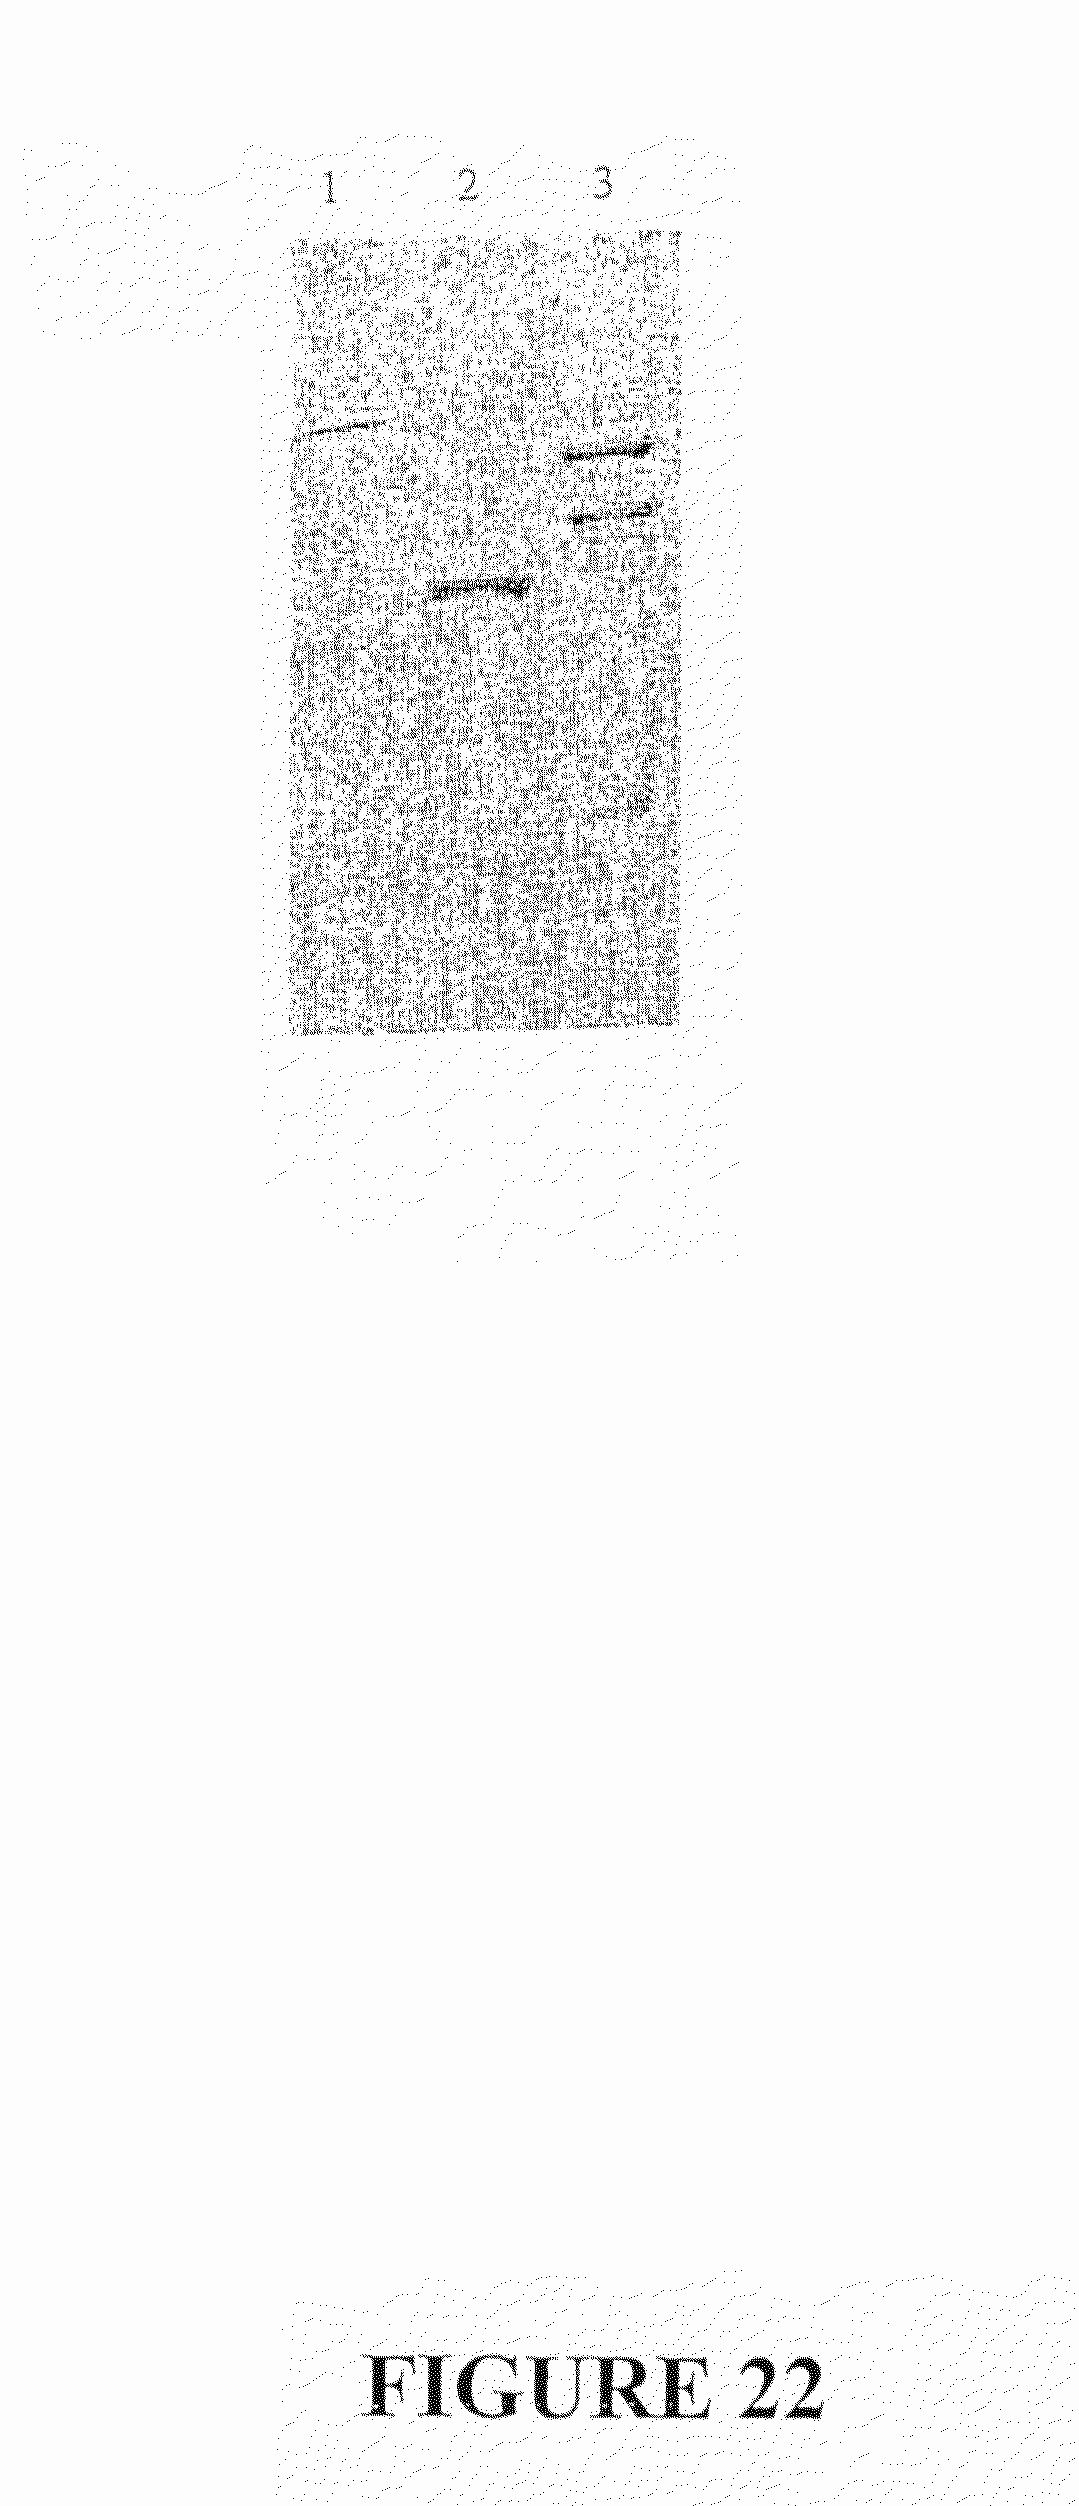 Ac Moore Art Drawing Book New Us B2 Plement Receptor 2 Tar